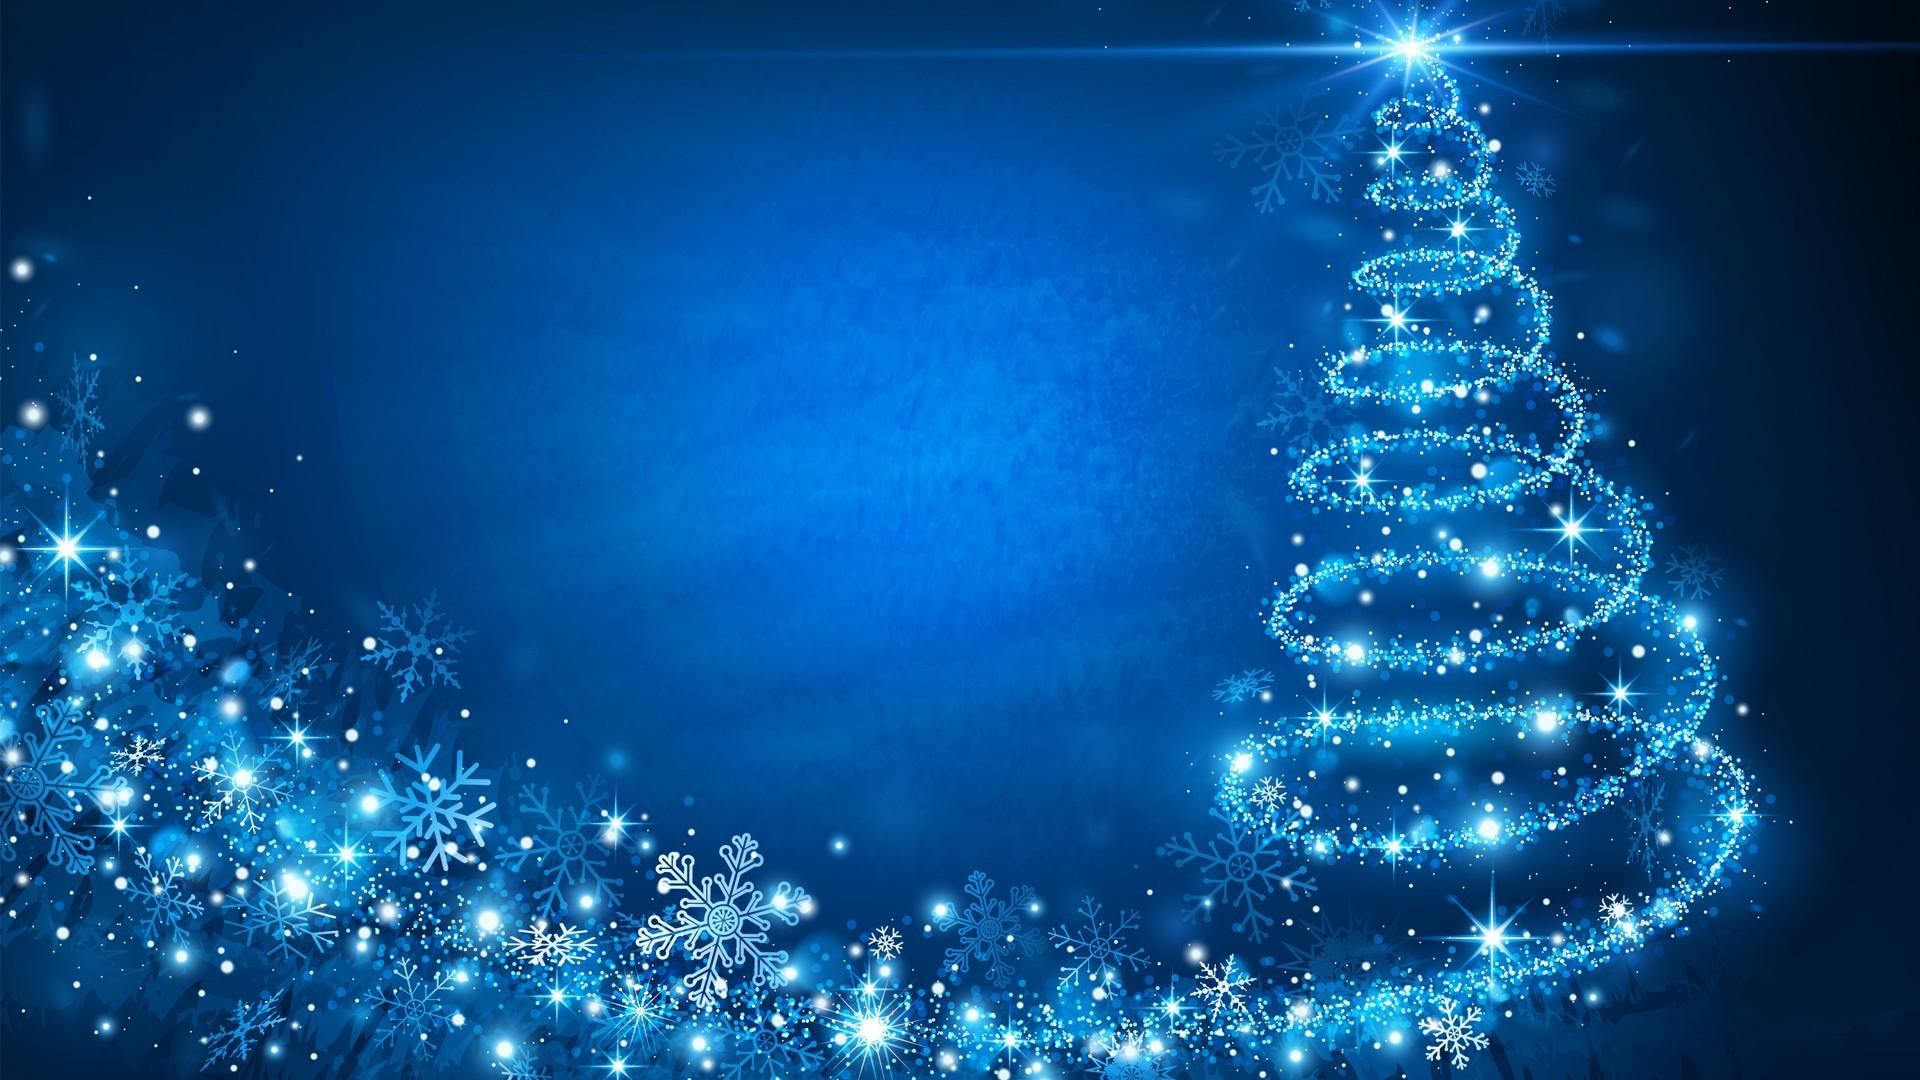 Christmas Desktop Pictures.Welborne Adorable Free Desktop Wallpaper For Christmas 43